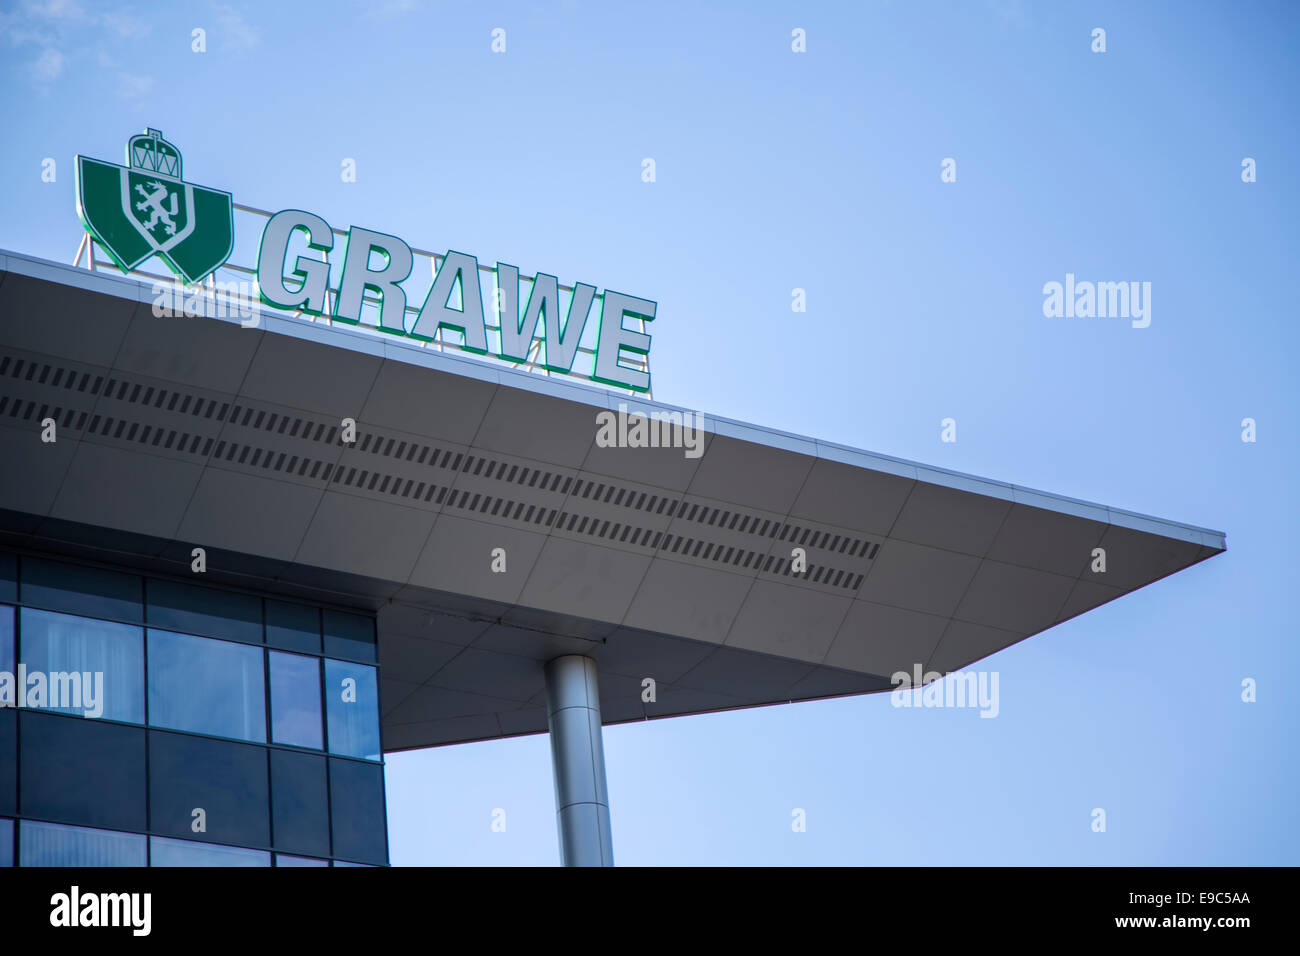 Detail of the Grawe building in Belgrade, Serbia. - Stock Image